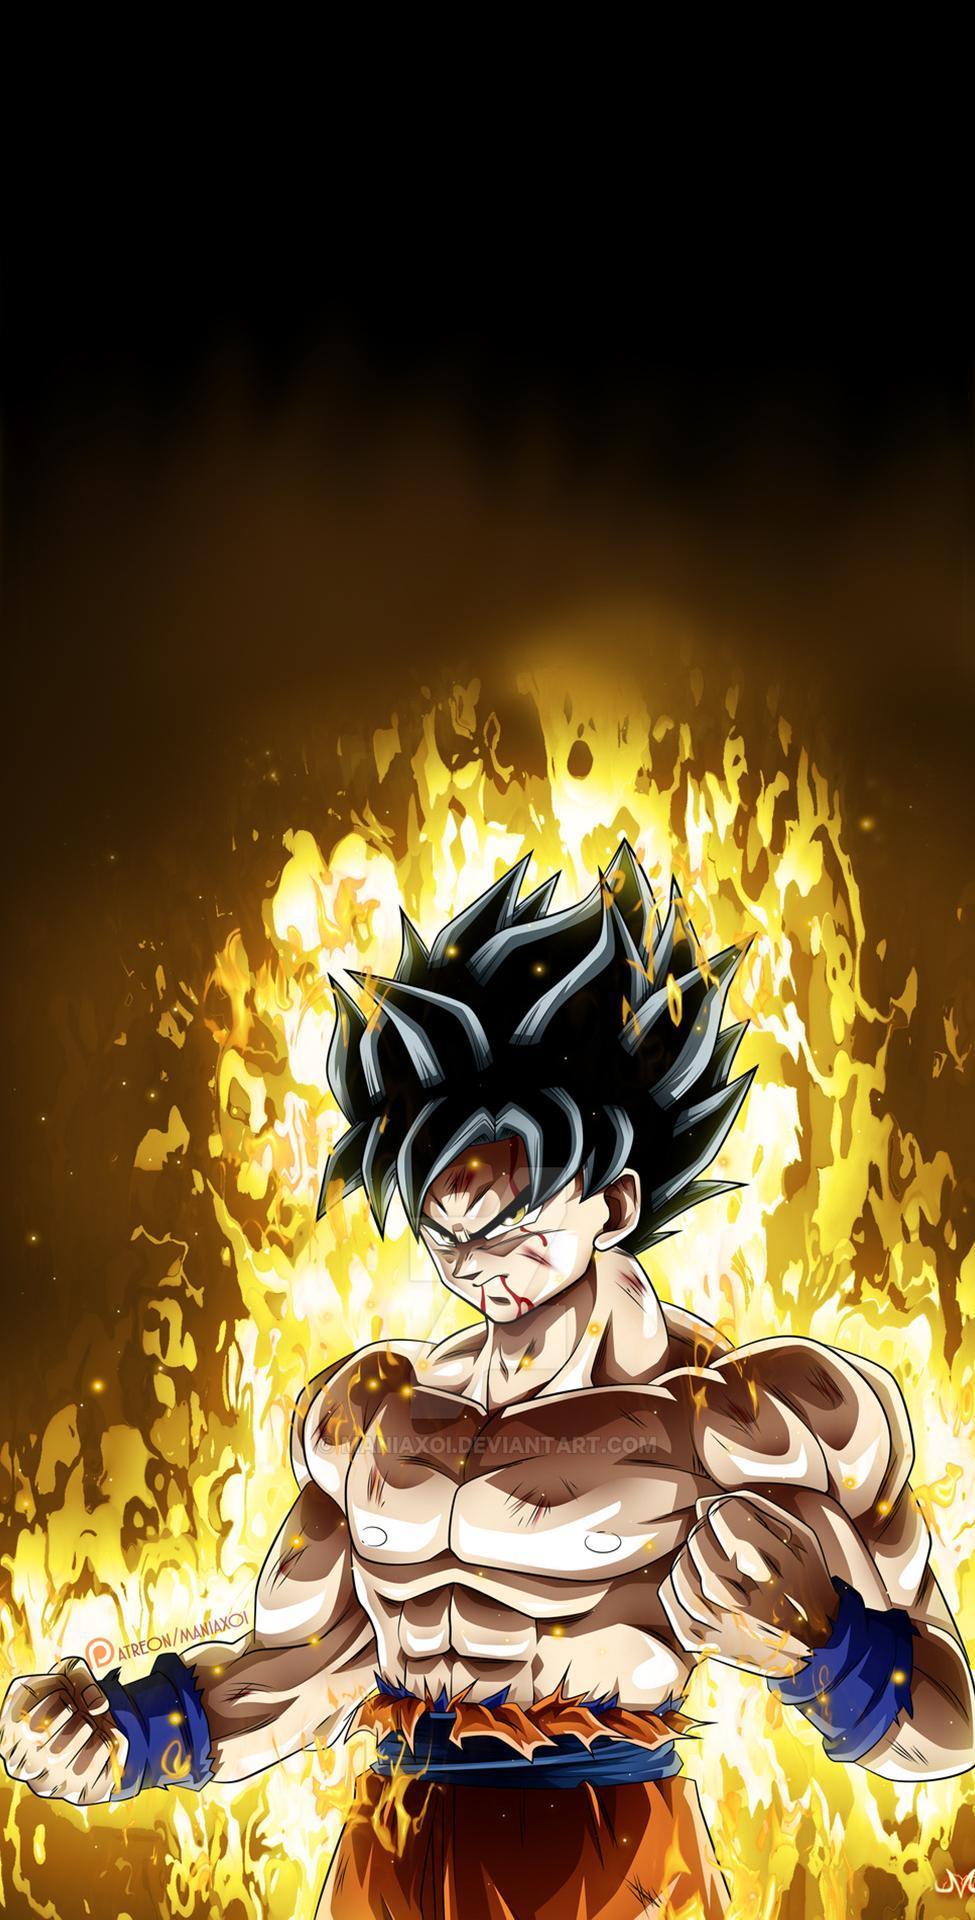 All goku forms ultra instinct wallpapers top free all goku forms ultra instinct backgrounds - Goku kamehameha live wallpaper ...